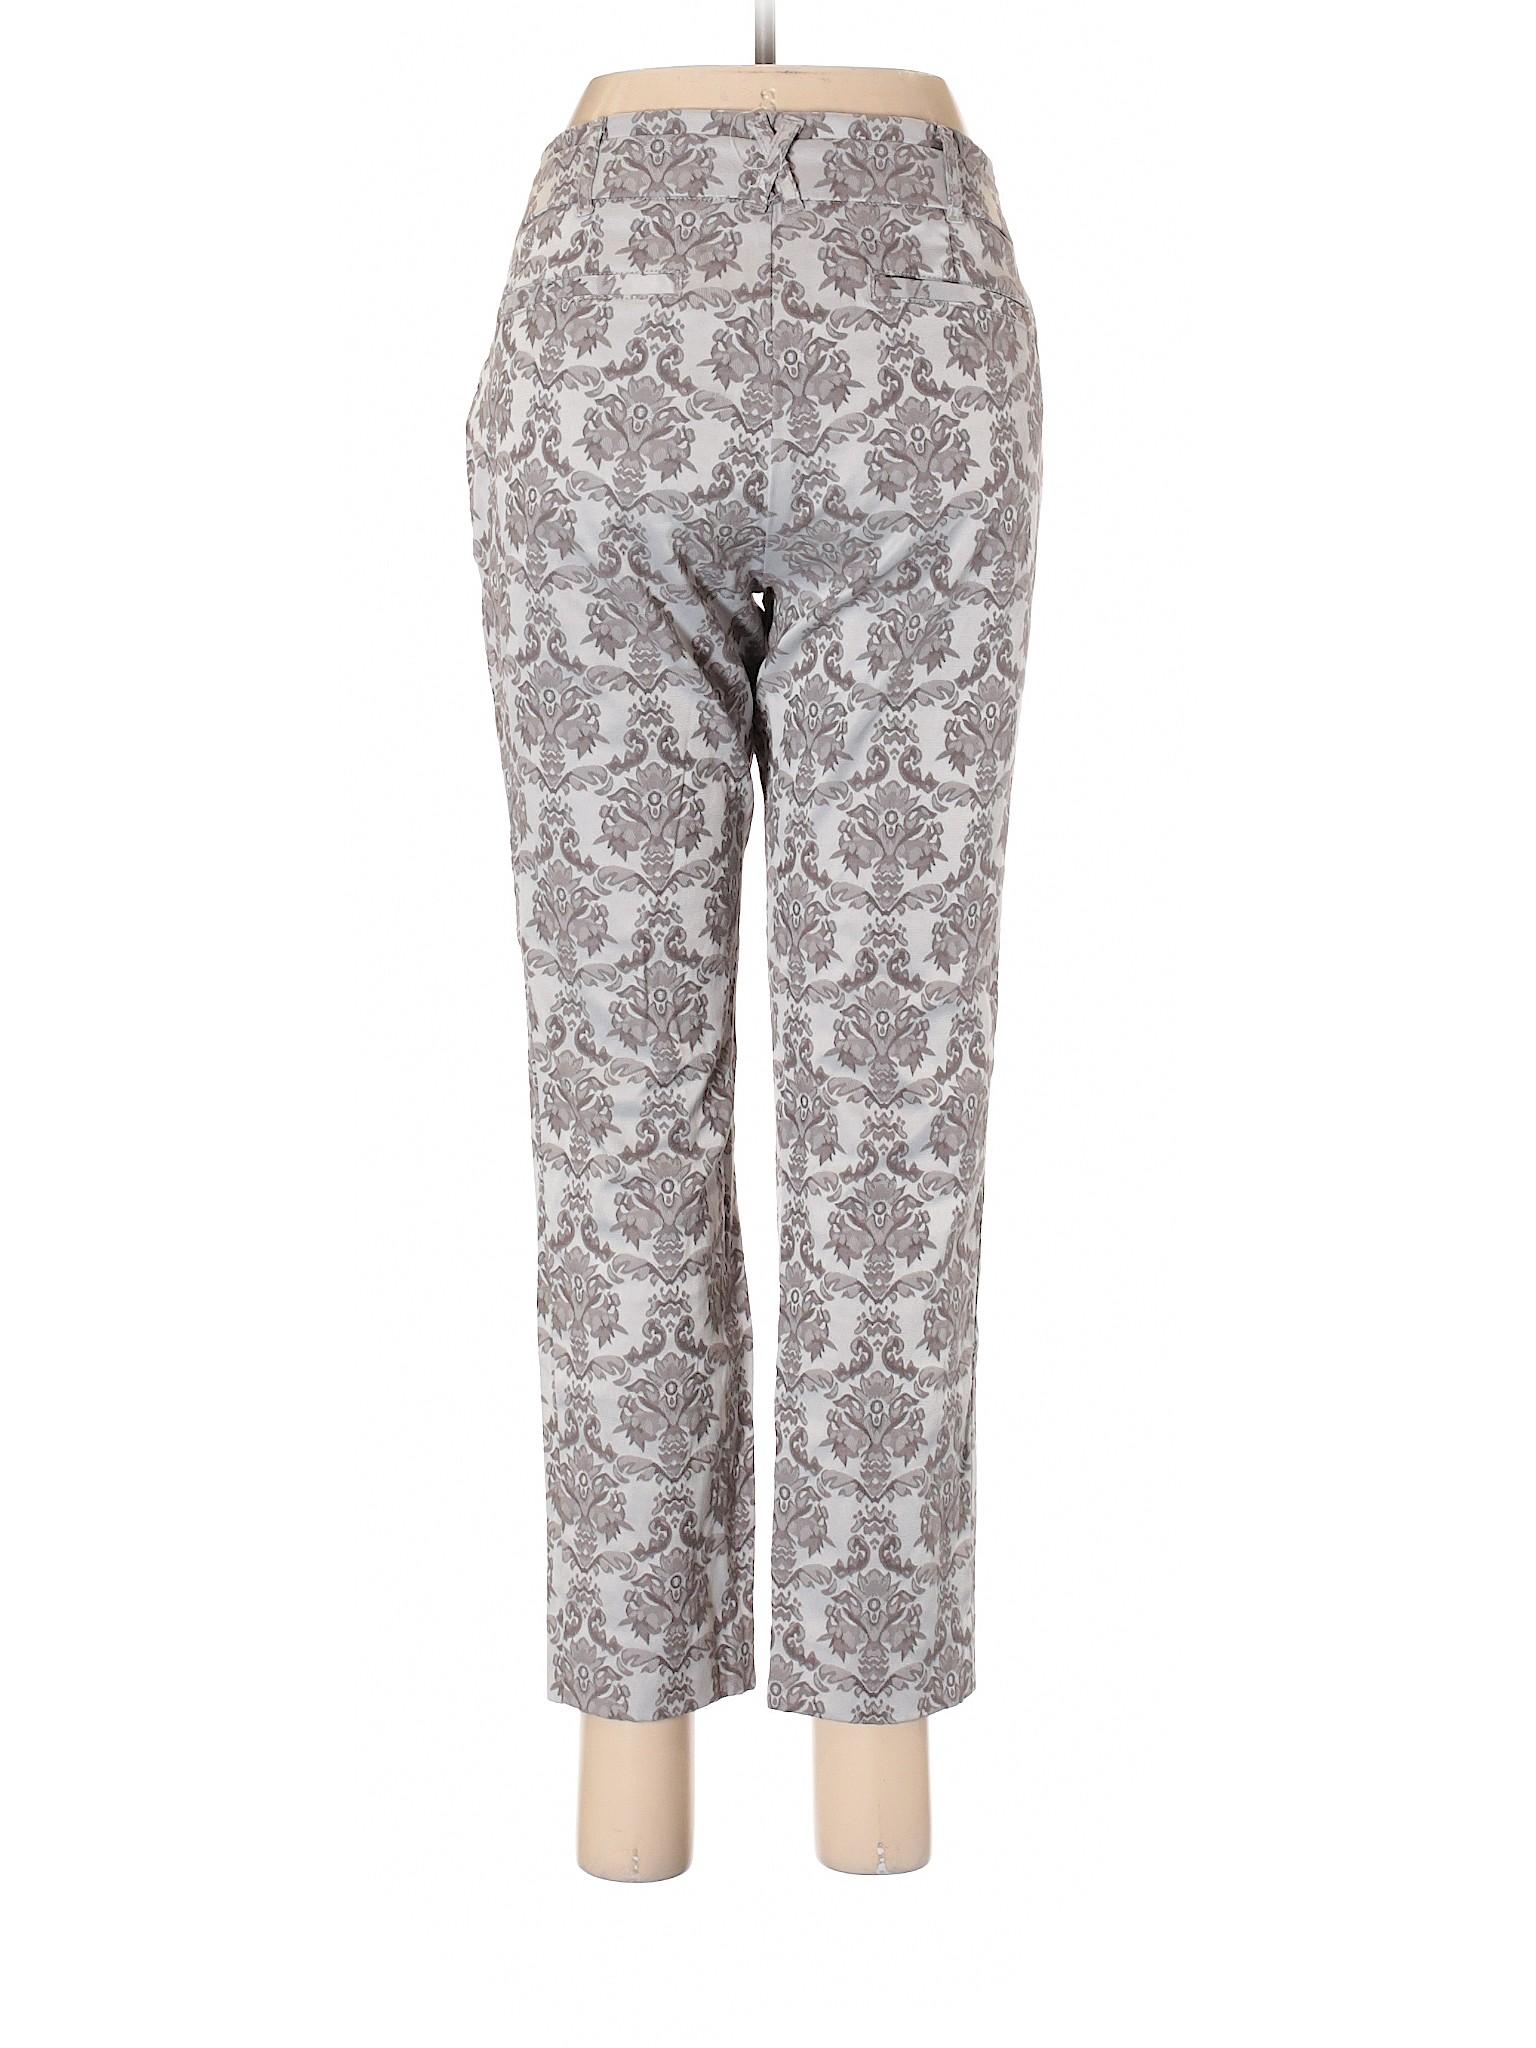 Cartonnier Boutique winter Cartonnier Dress Pants winter Dress Pants Boutique xYxqwBdg